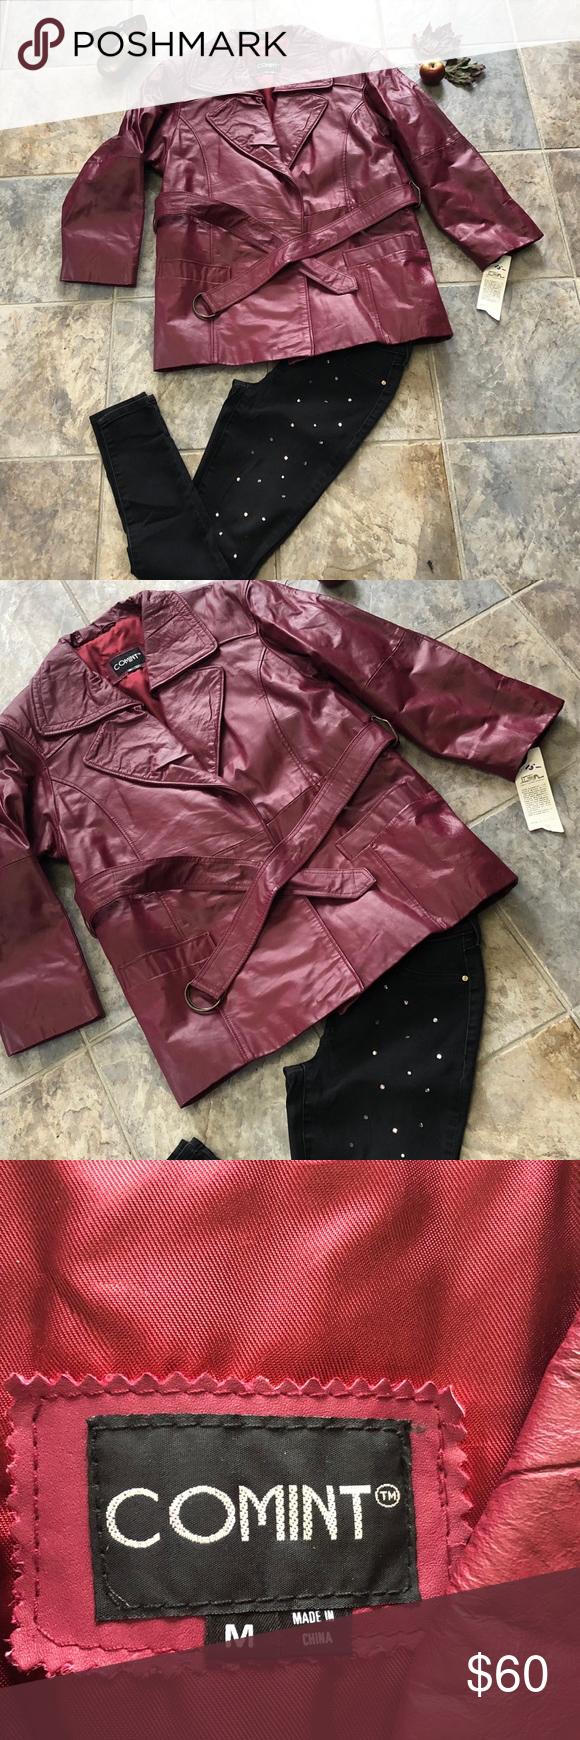 Vintage Comint Leather Coat Sz Med Nwt Leather Coat Clothes Design Fashion Design [ 1740 x 580 Pixel ]